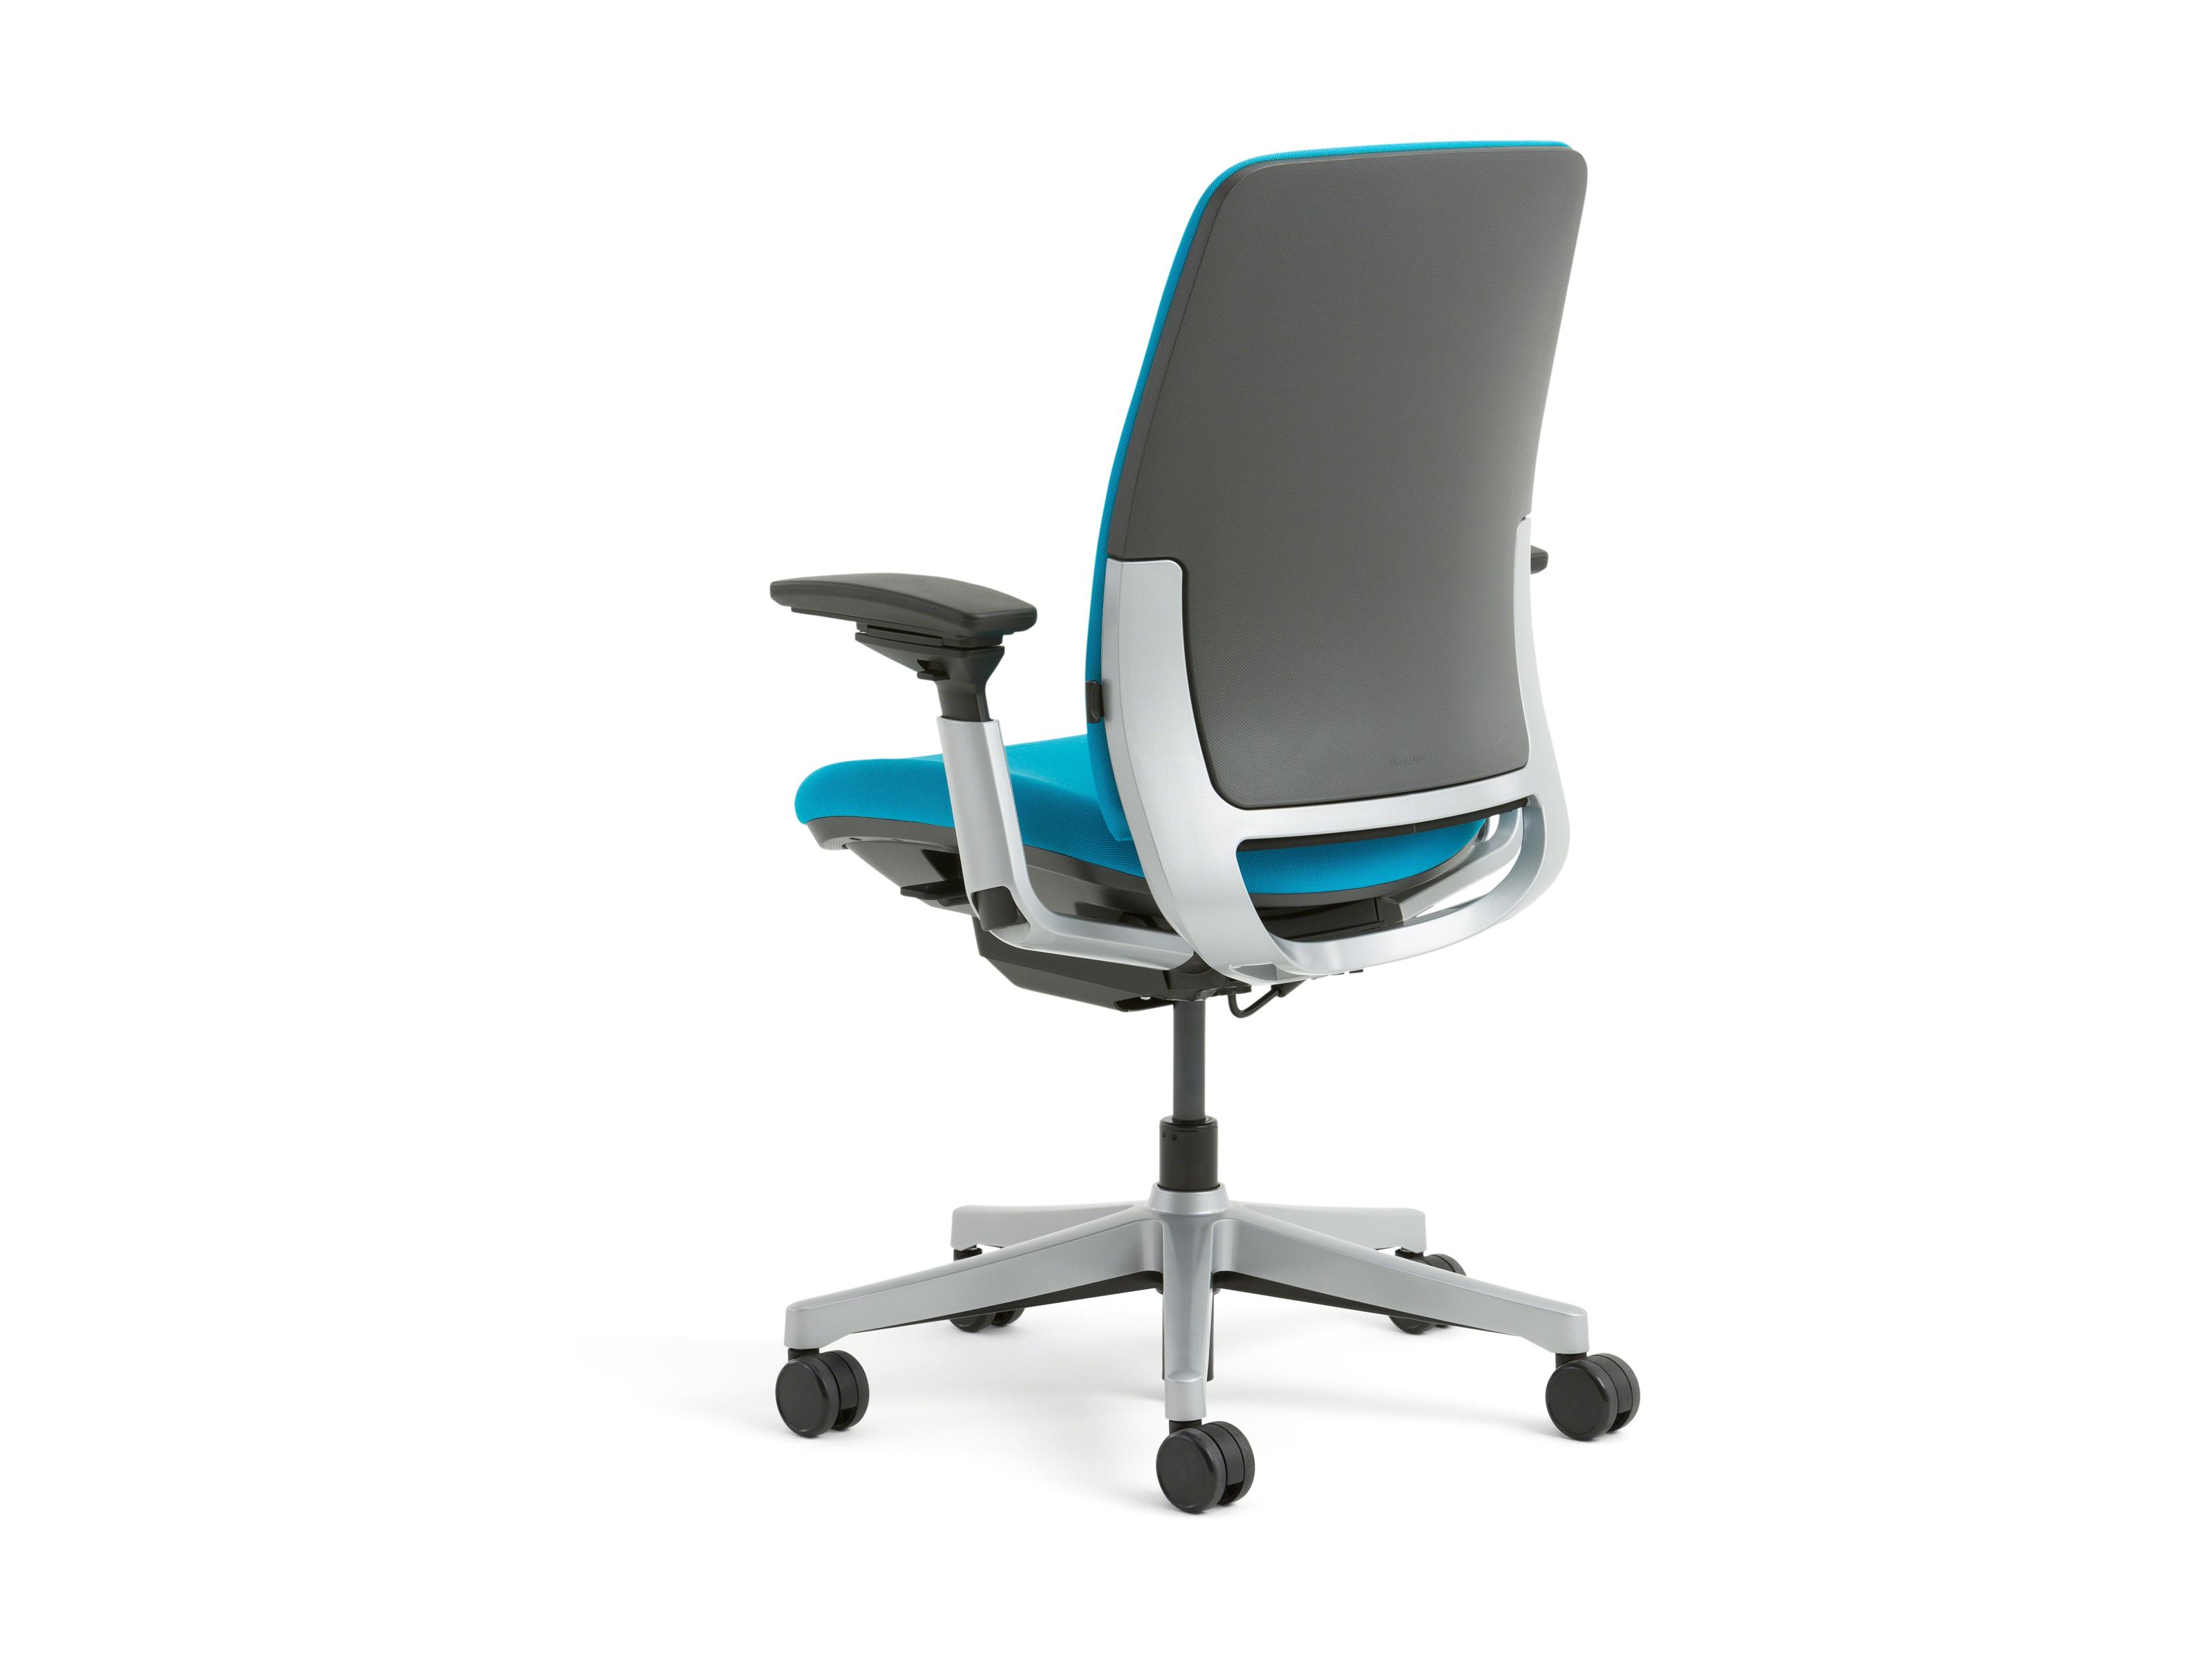 steelcase amia chair recall lightweight portable media